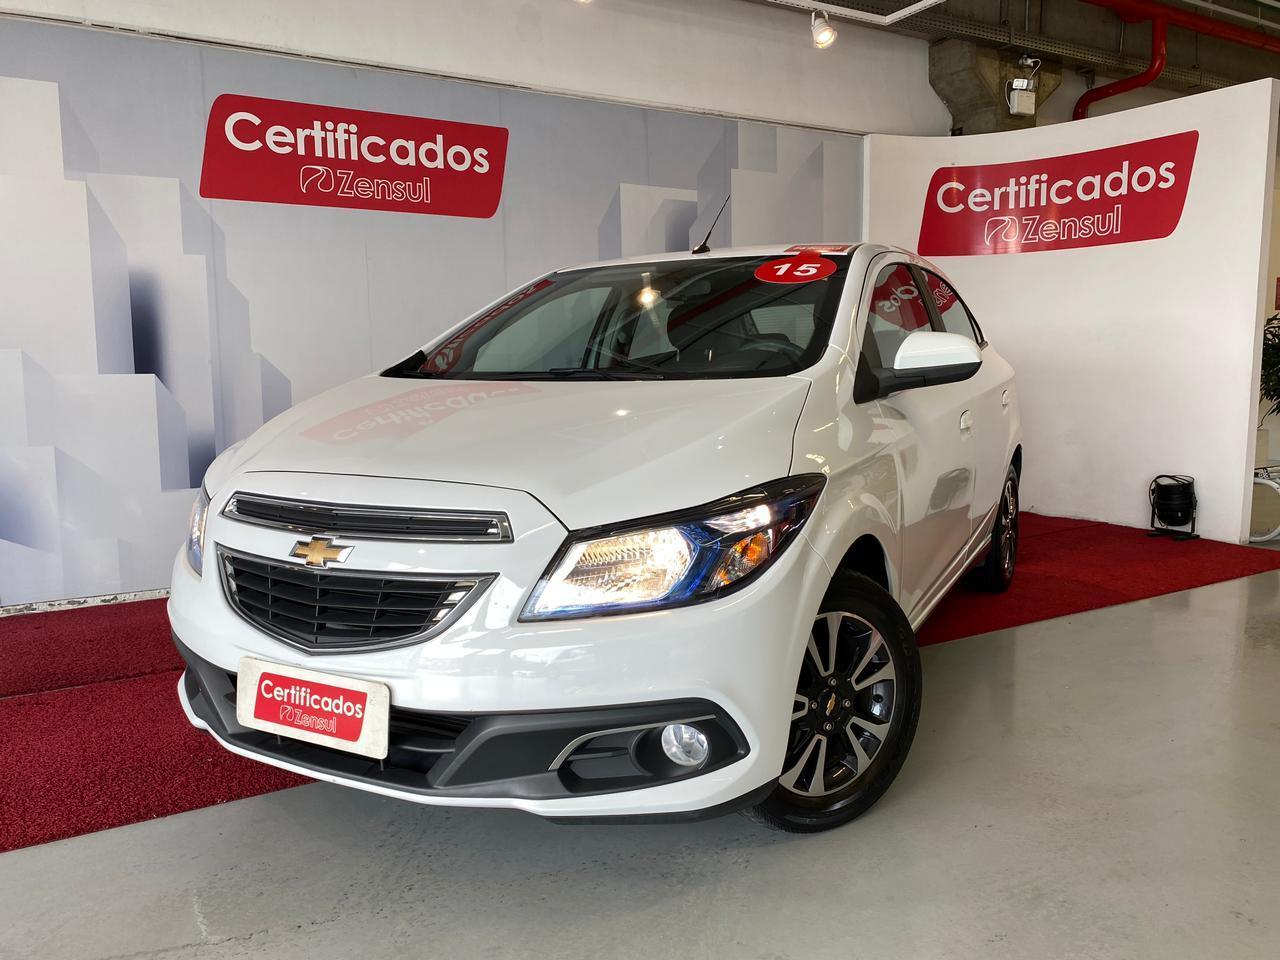 Comprar seminovo Chevrolet ONIX HATCH LTZ 1.4 8V FlexPower 5p Mec. no Certificados Zensul